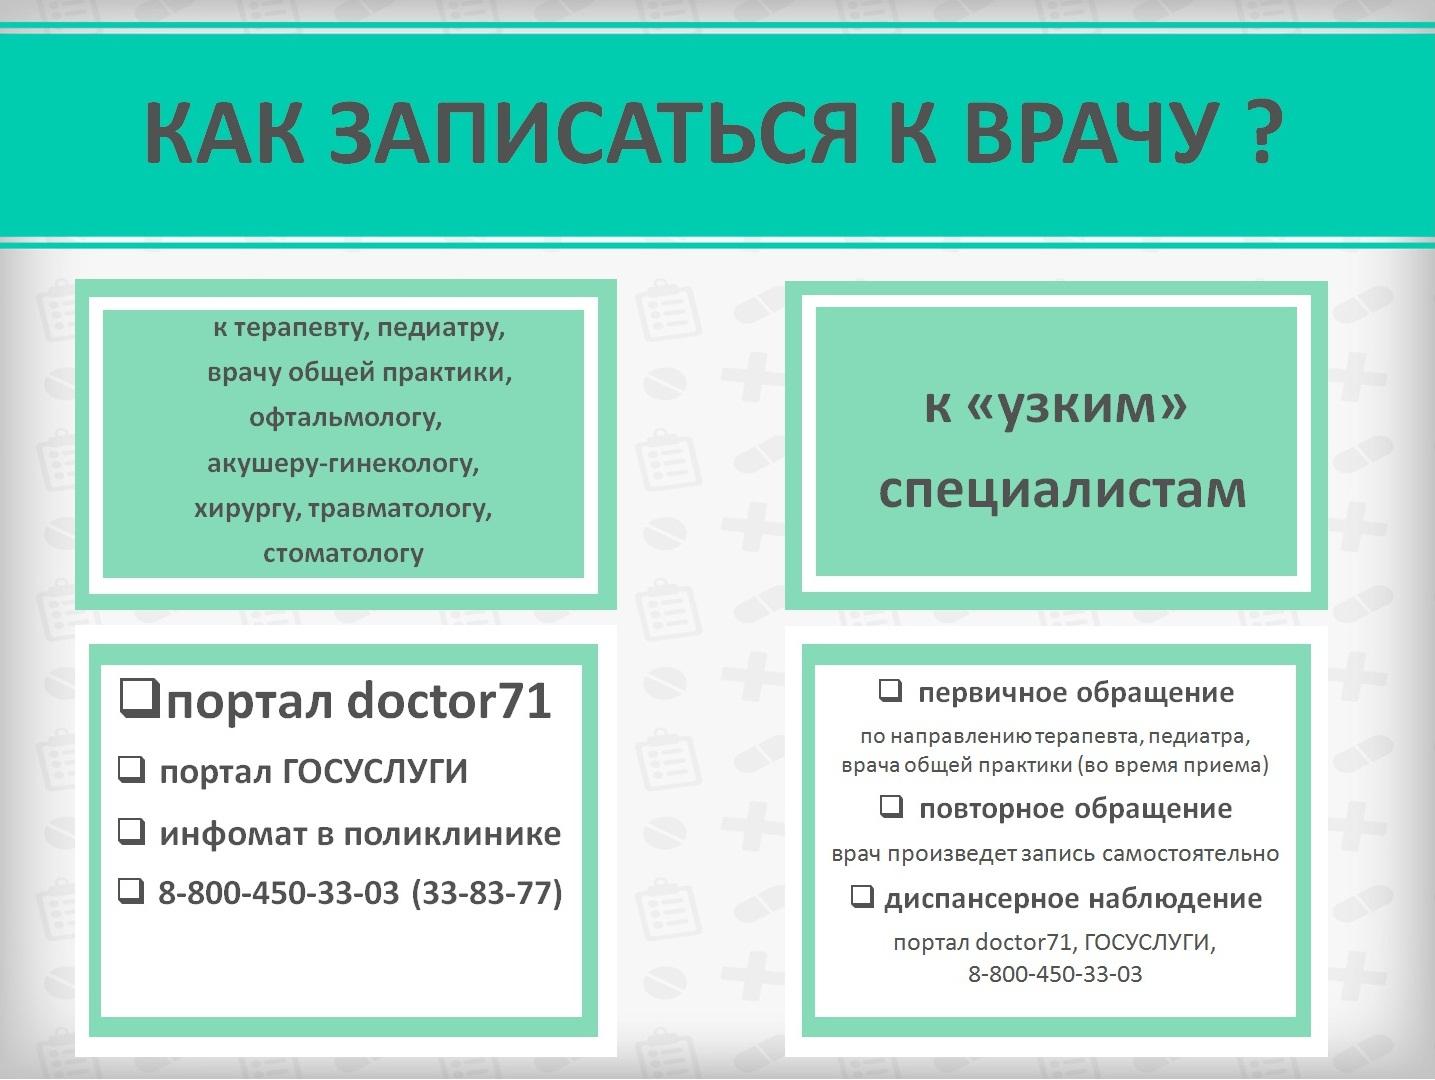 банк хоум кредит димитровград адрес